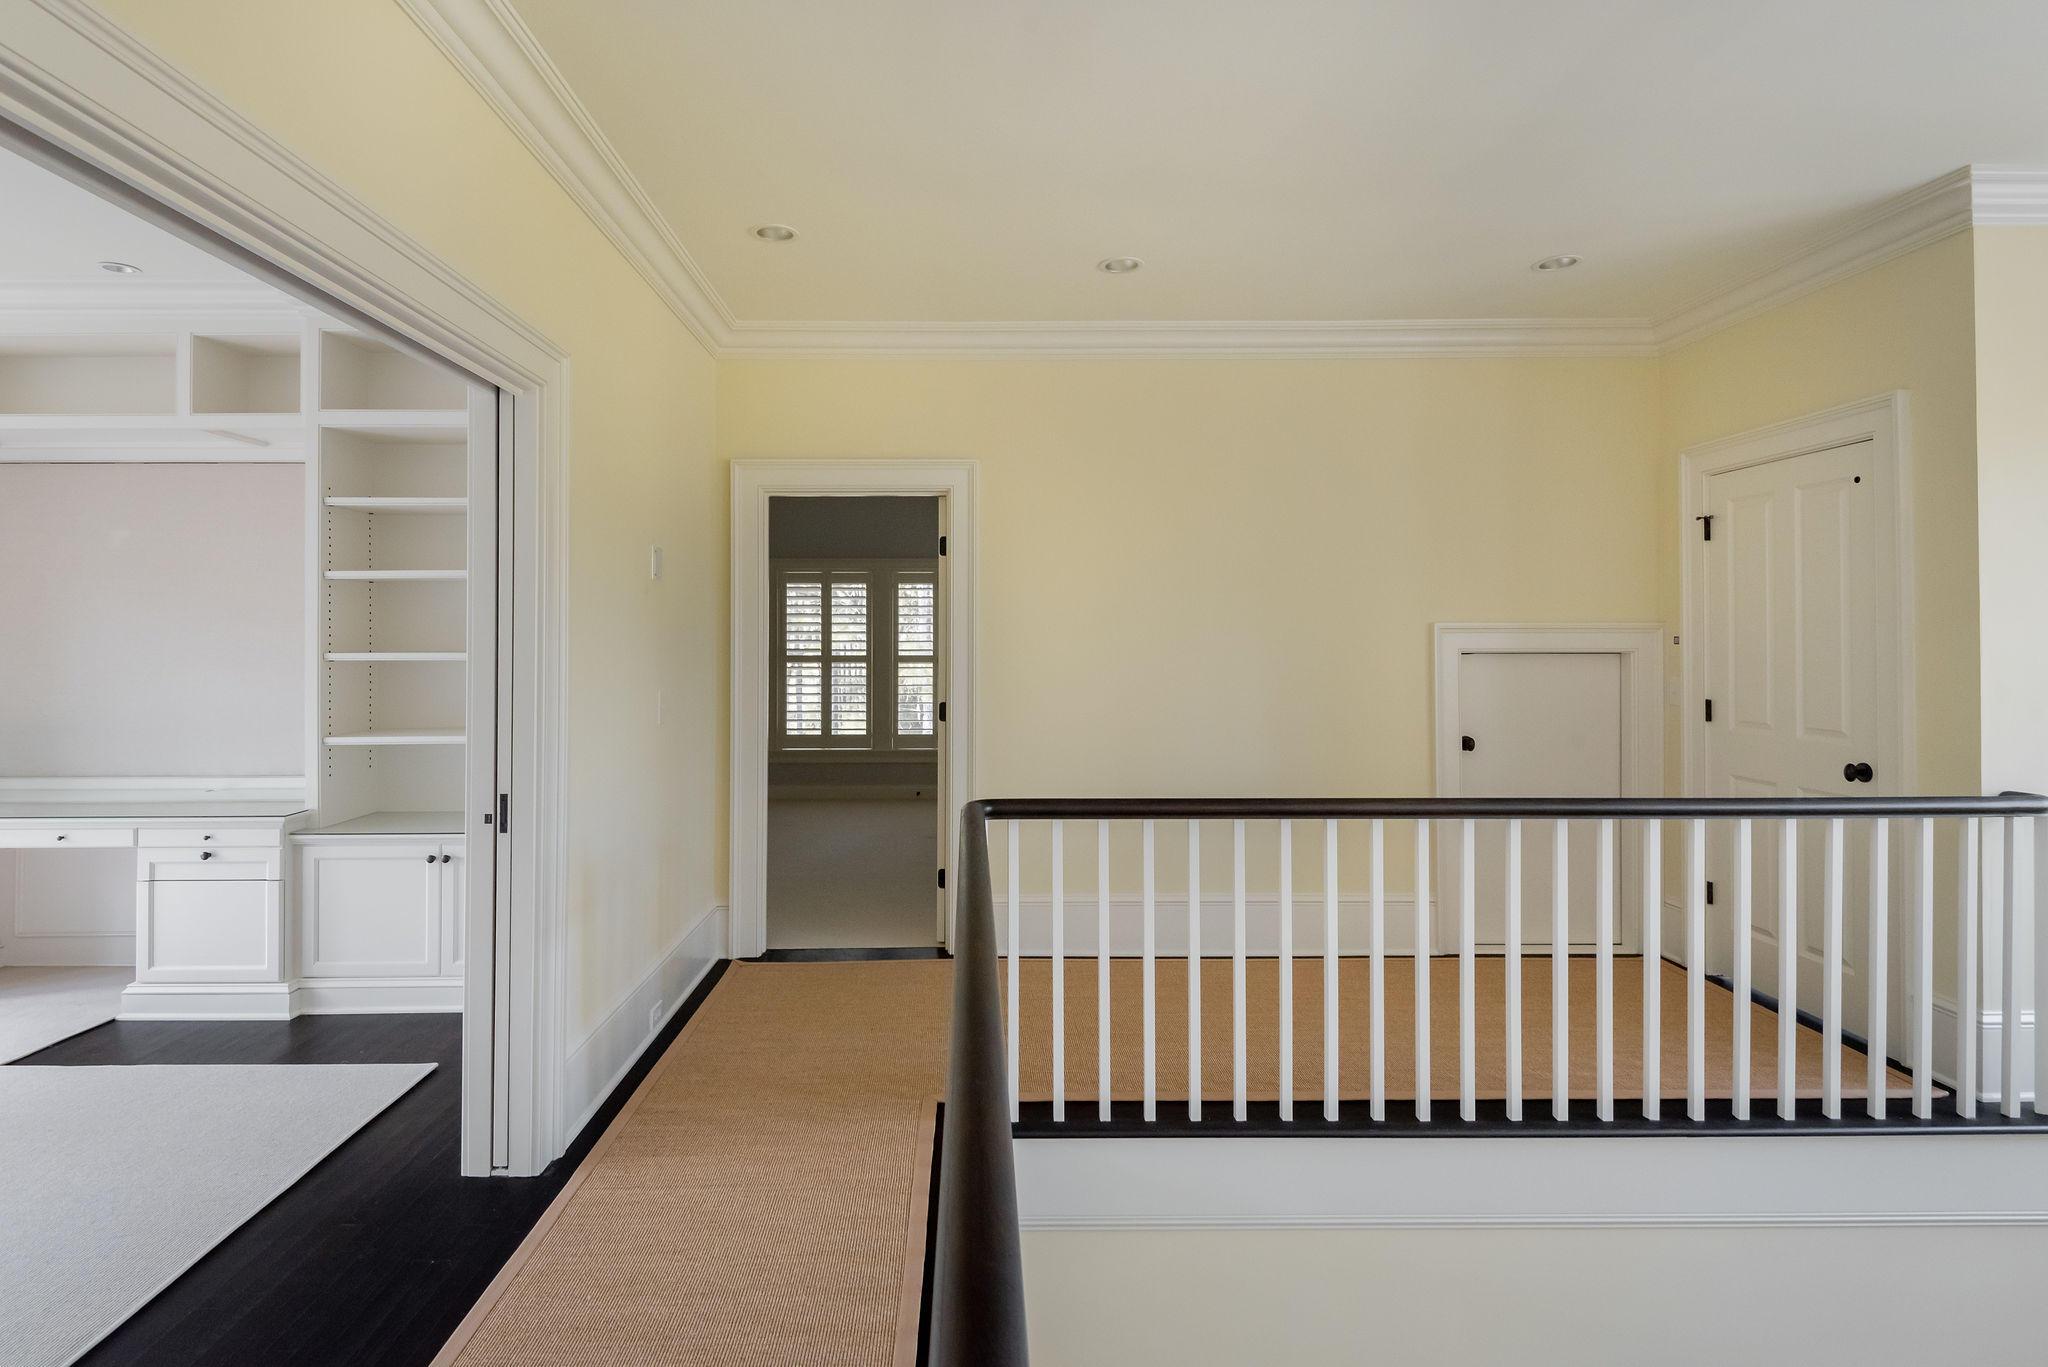 Kiawah Island Homes For Sale - 3 Grey Widgeon, Kiawah Island, SC - 26